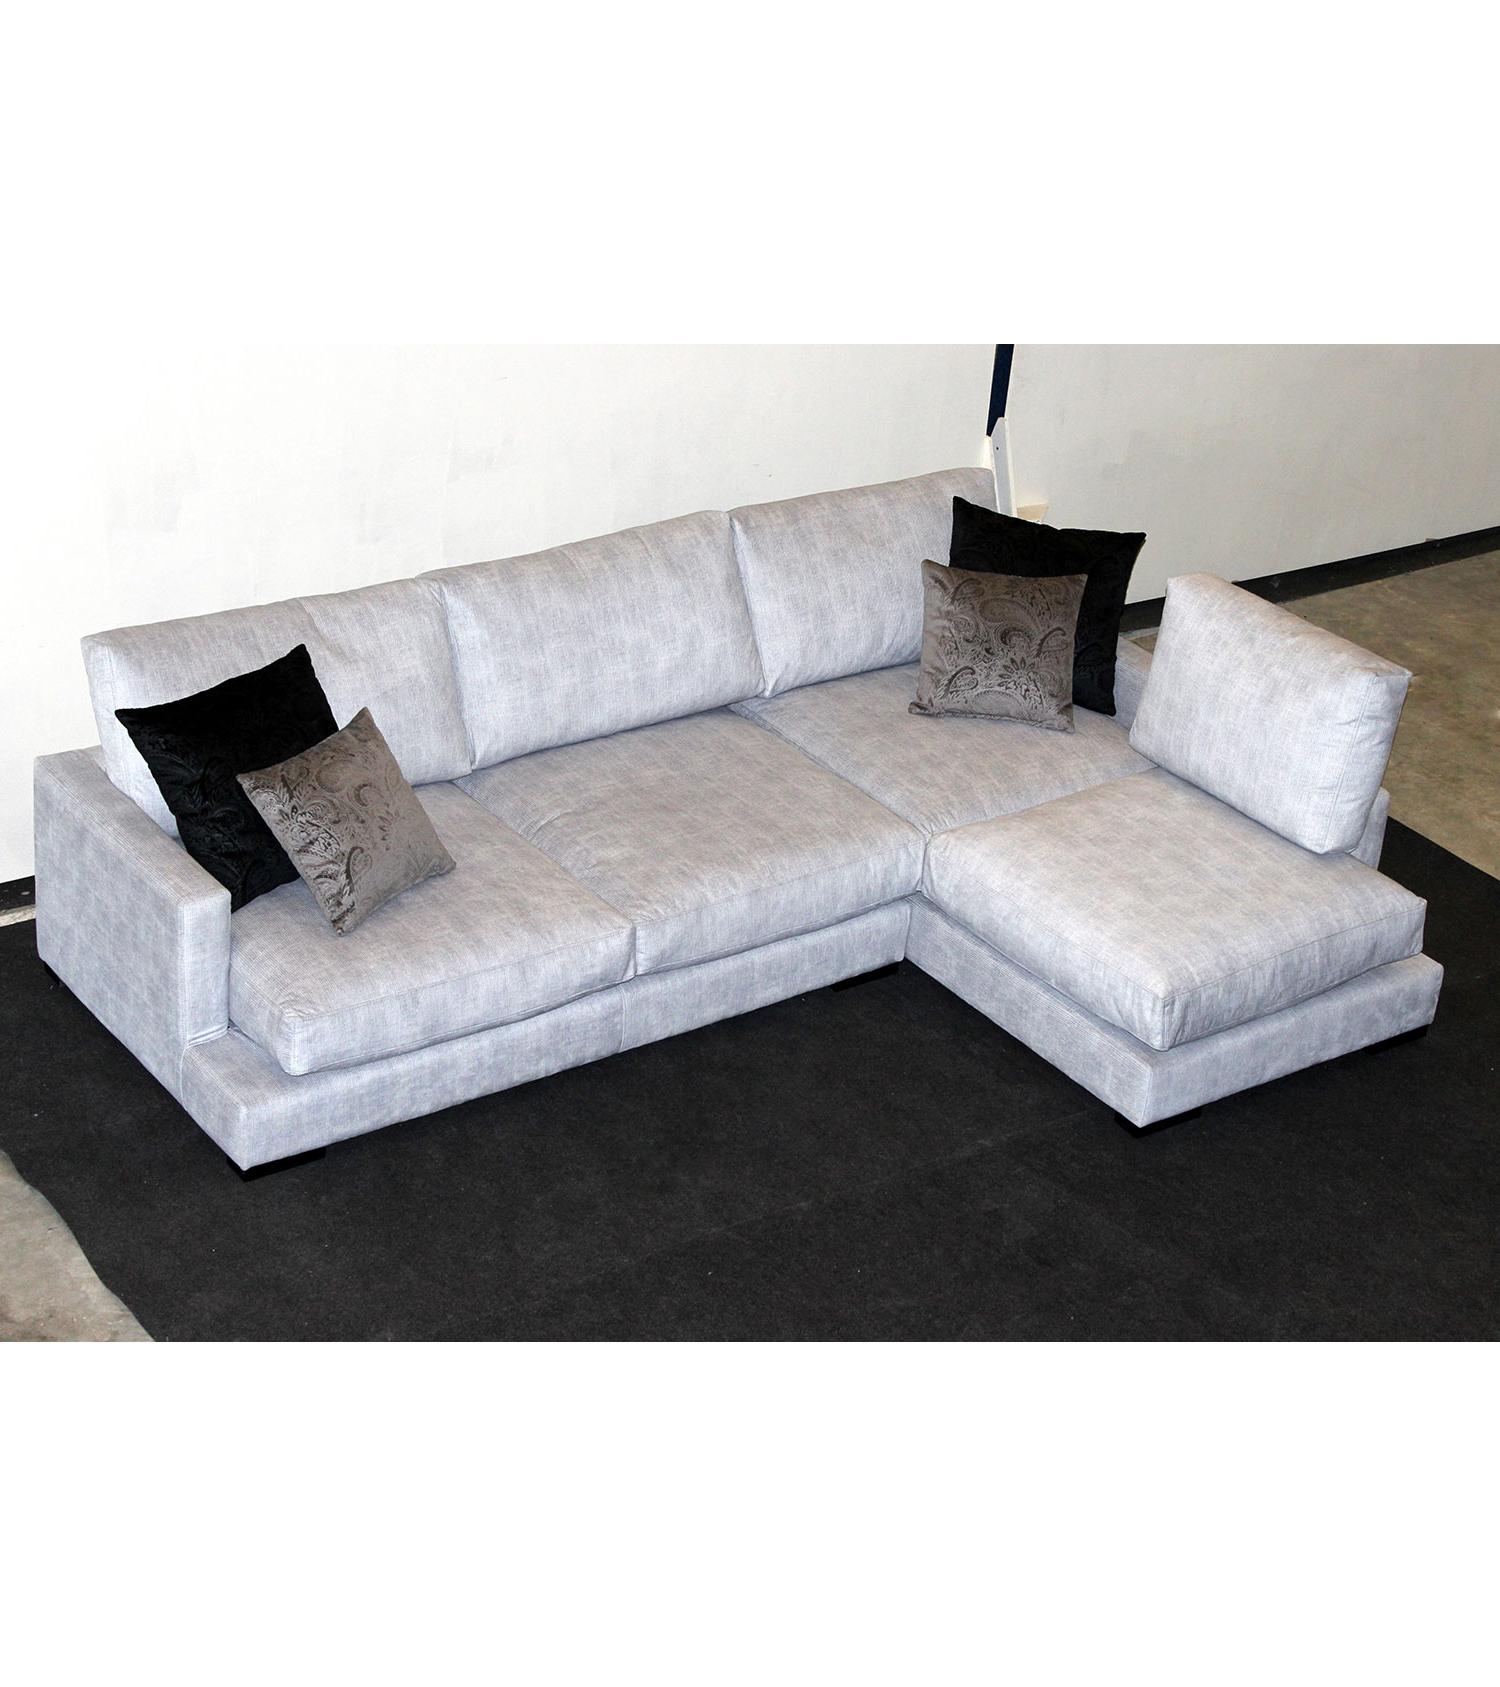 Sofas Baratos 3ldq Modelo Miami Piel sofà S Valencia